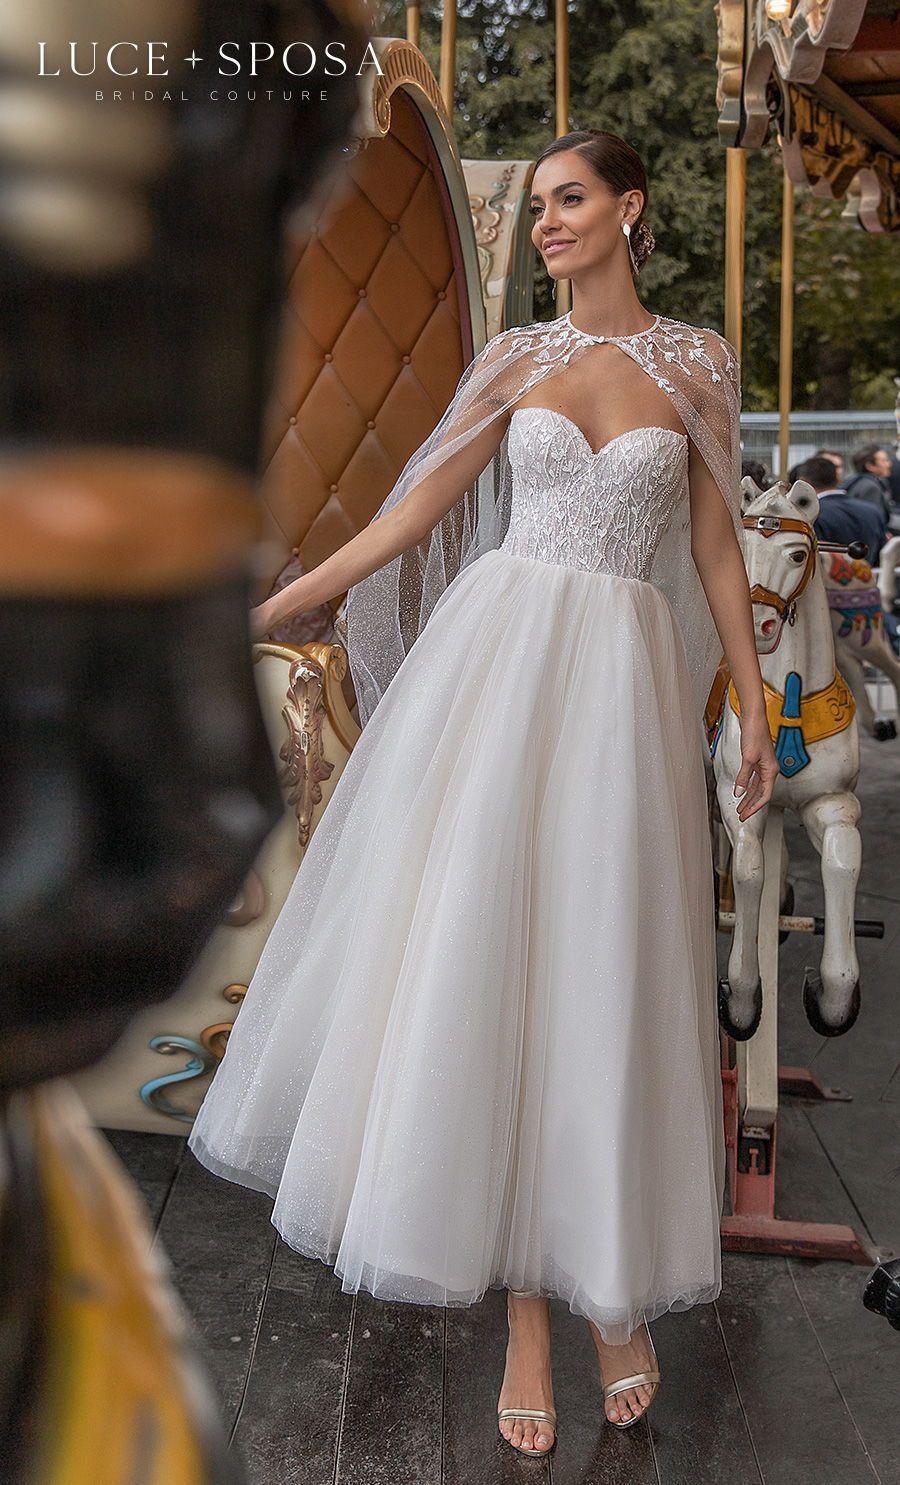 Luce Sposa Spring Summer 2021 Wedding Dresses Istanbul Paris Bridal Collections Wedding Inspirasi Cape Wedding Dress Wedding Dress For Short Women Edgy Wedding Dress [ 1485 x 900 Pixel ]